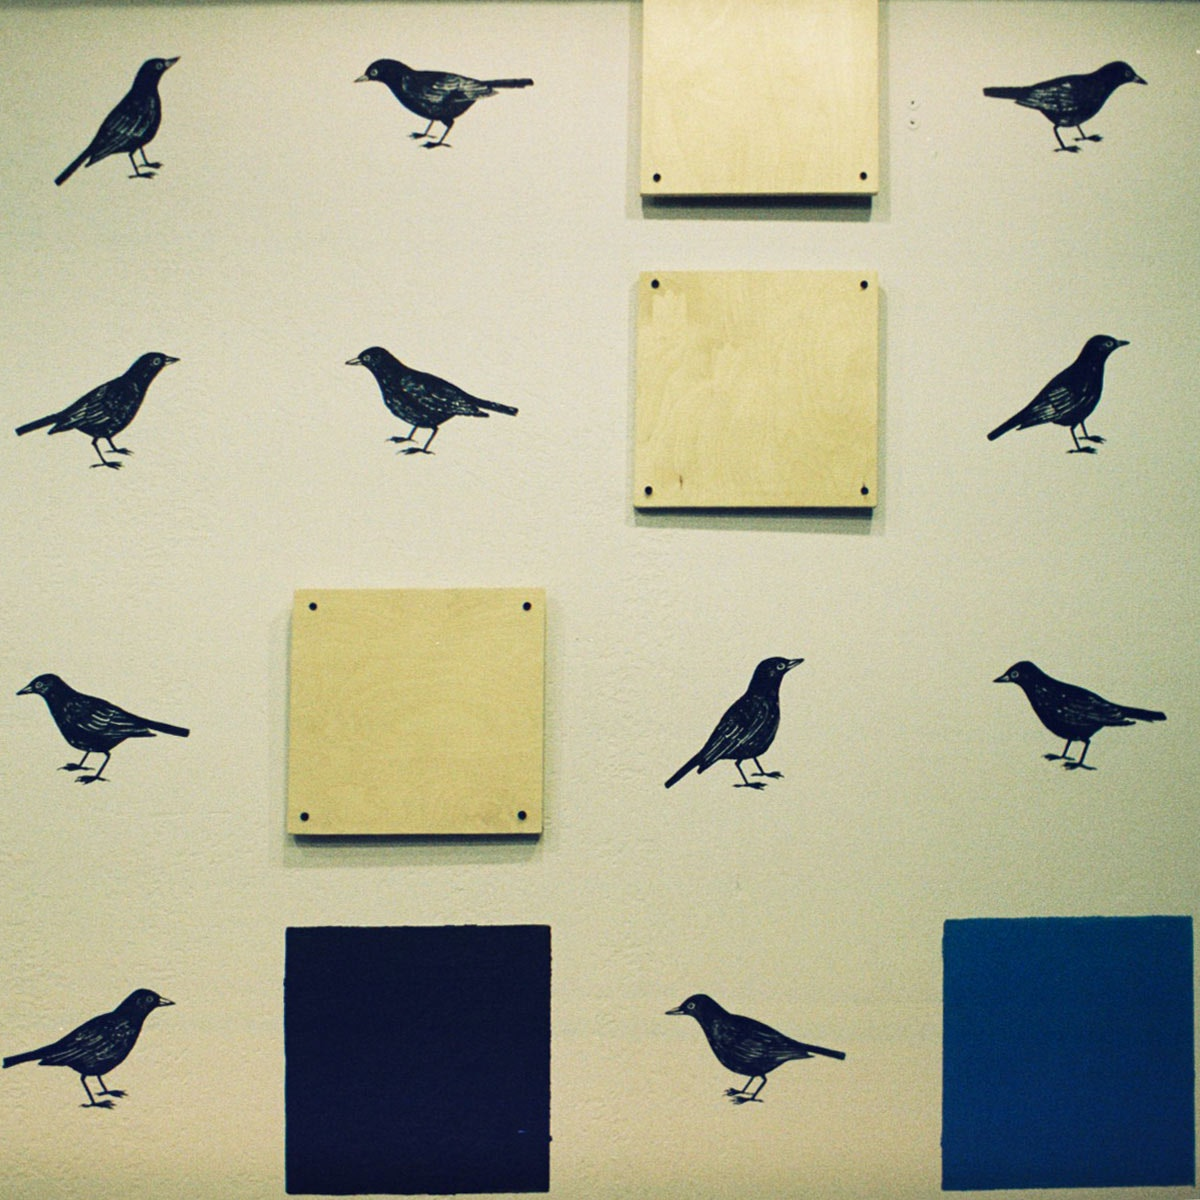 Whitebeard Blackbird